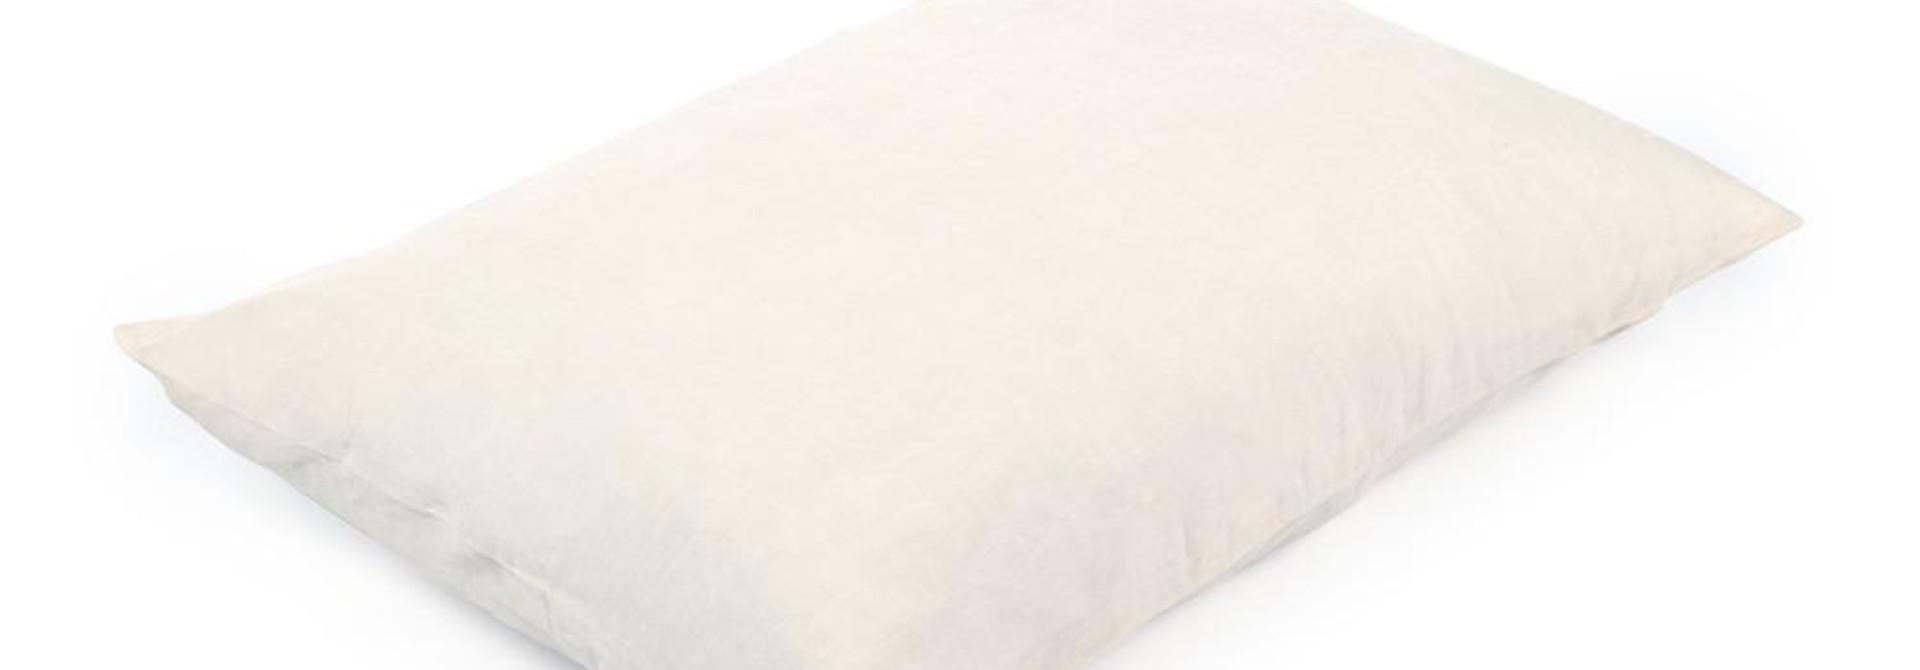 Pillow Sham - Santiago White Sand Queen - Set of 2